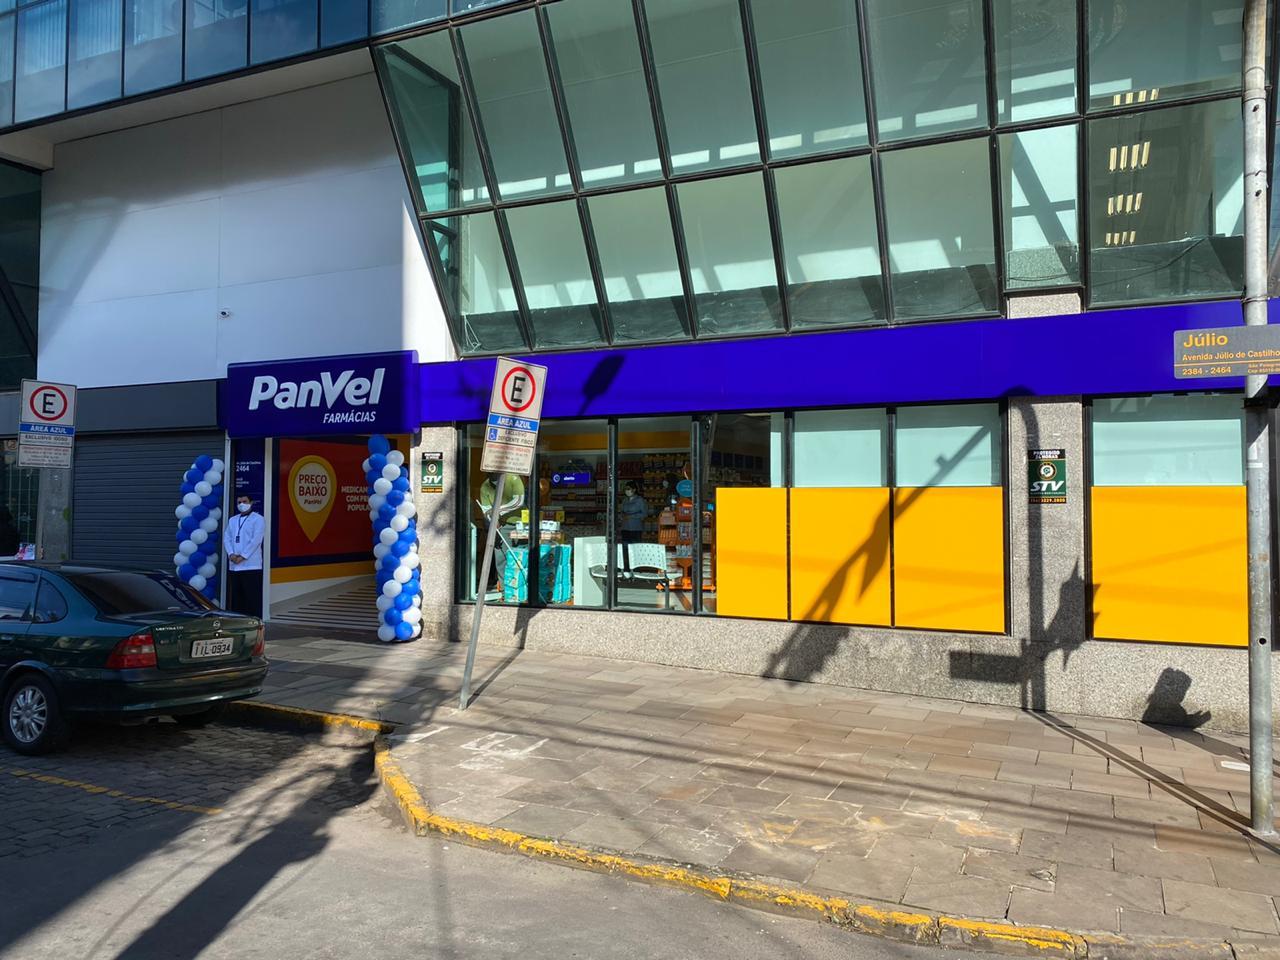 Panvel abre 15 vagas para farmacêuticos na Serra